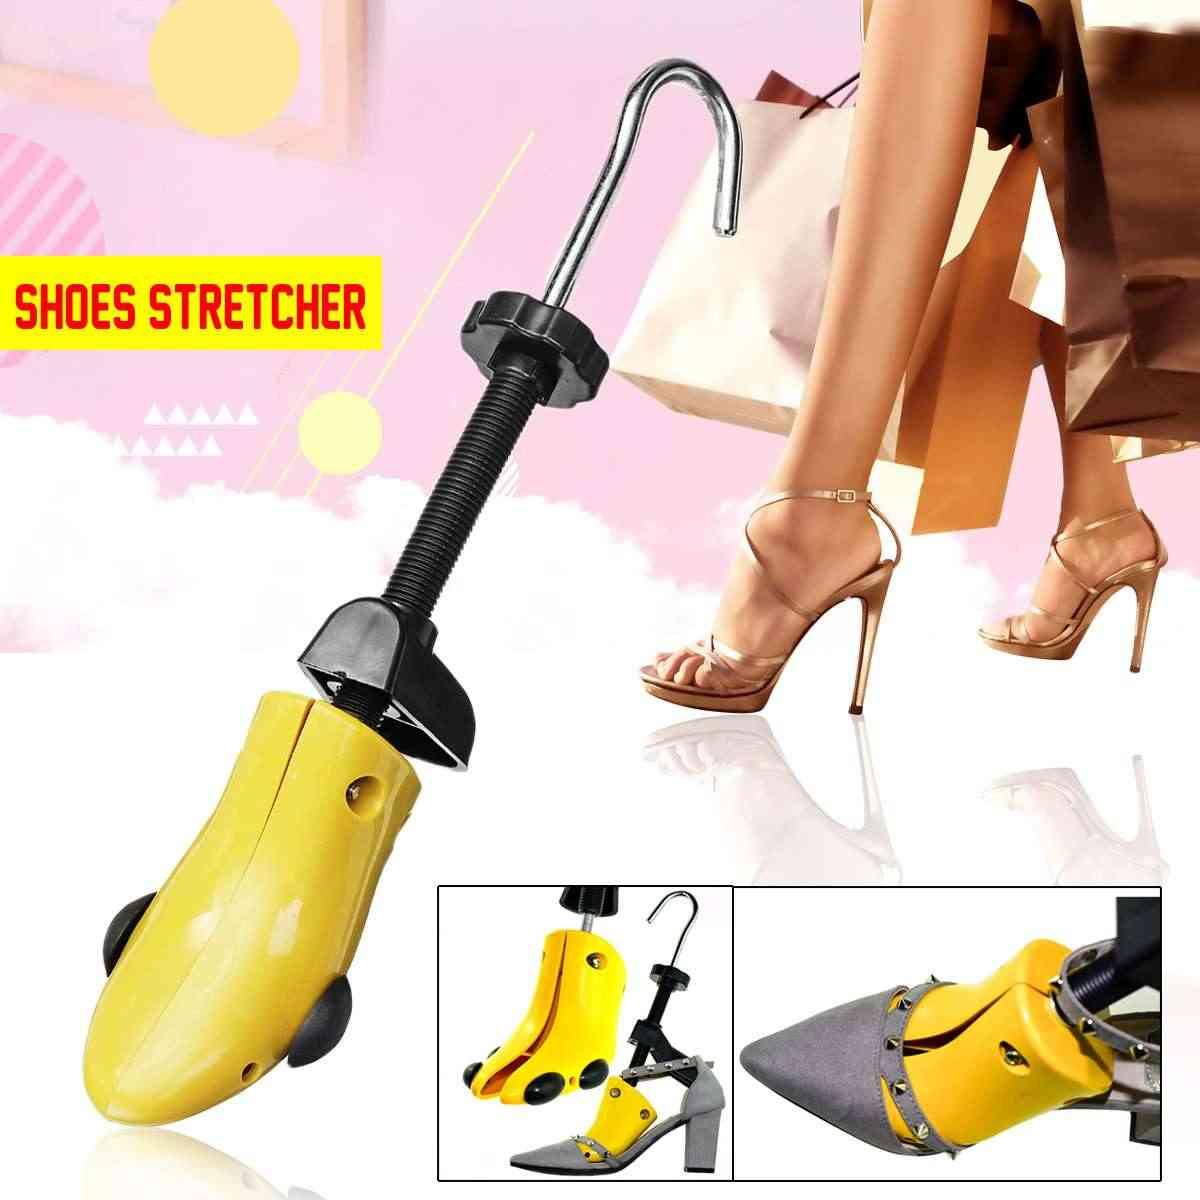 b84543801a9 Size S/M/L 28-48 Men Womens 2-Way Adjustable Shoes Stretcher Heels Boots  Trees Shaper Expander Unisex Wooden Maintain Shape